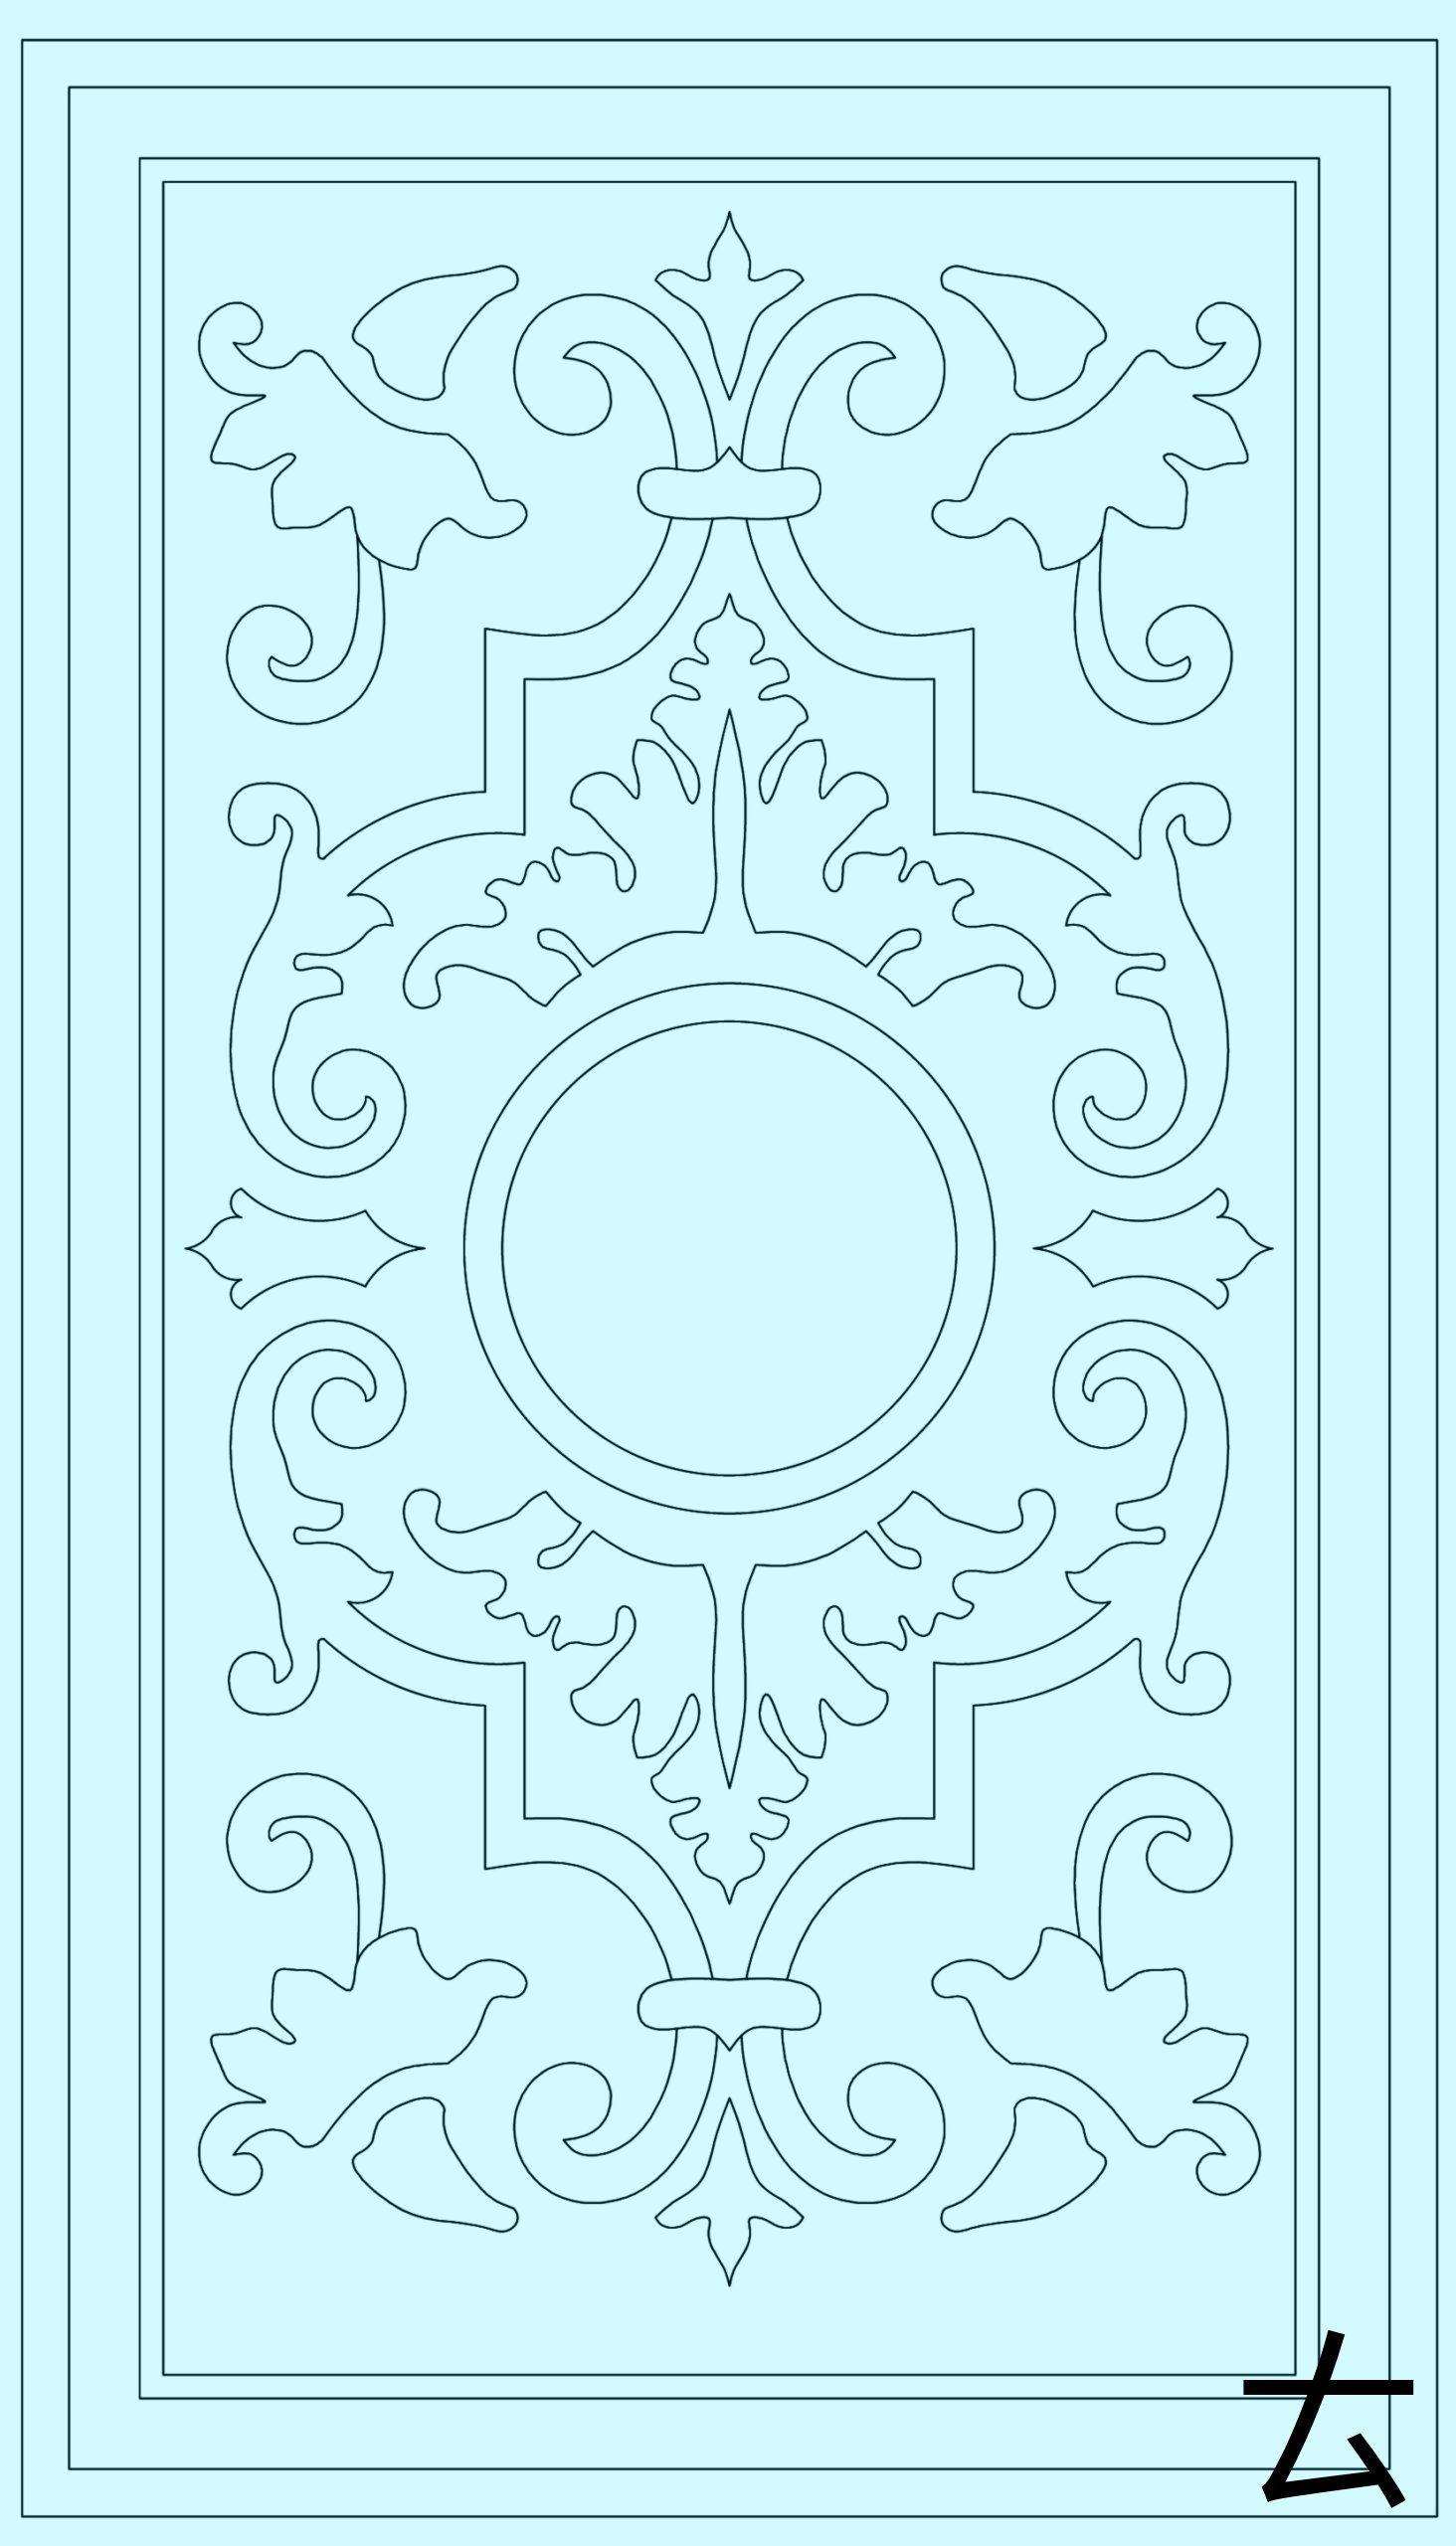 H Olcay Sayiner Autocad Draw Medallion Mandala Autocad Ceilingdesignwithfan Draw Ho Schablonenmuster Schablone Designs Bastelarbeiten